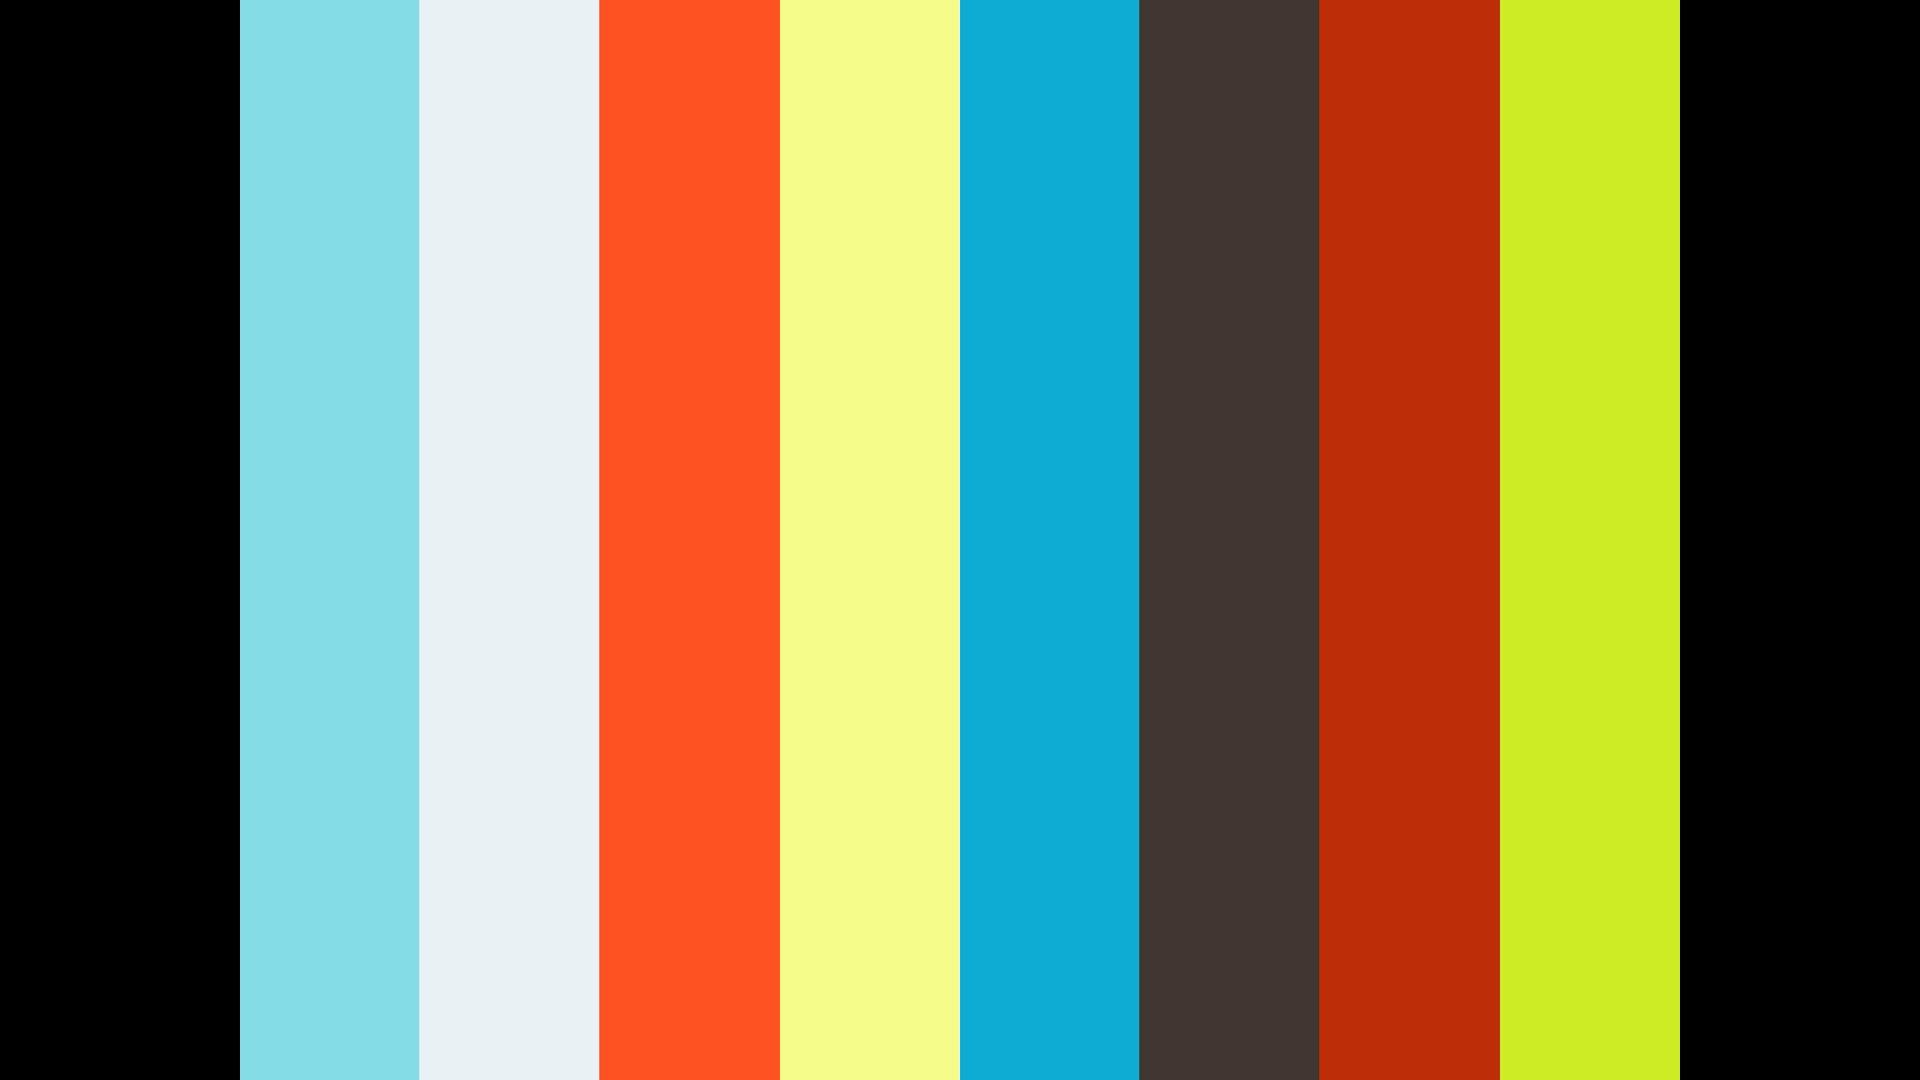 thiopianismtv # ንትርክ crosstalk Abiy Misseducational System የአቢይ አሰሳች የትምህርት ስርዓት 23